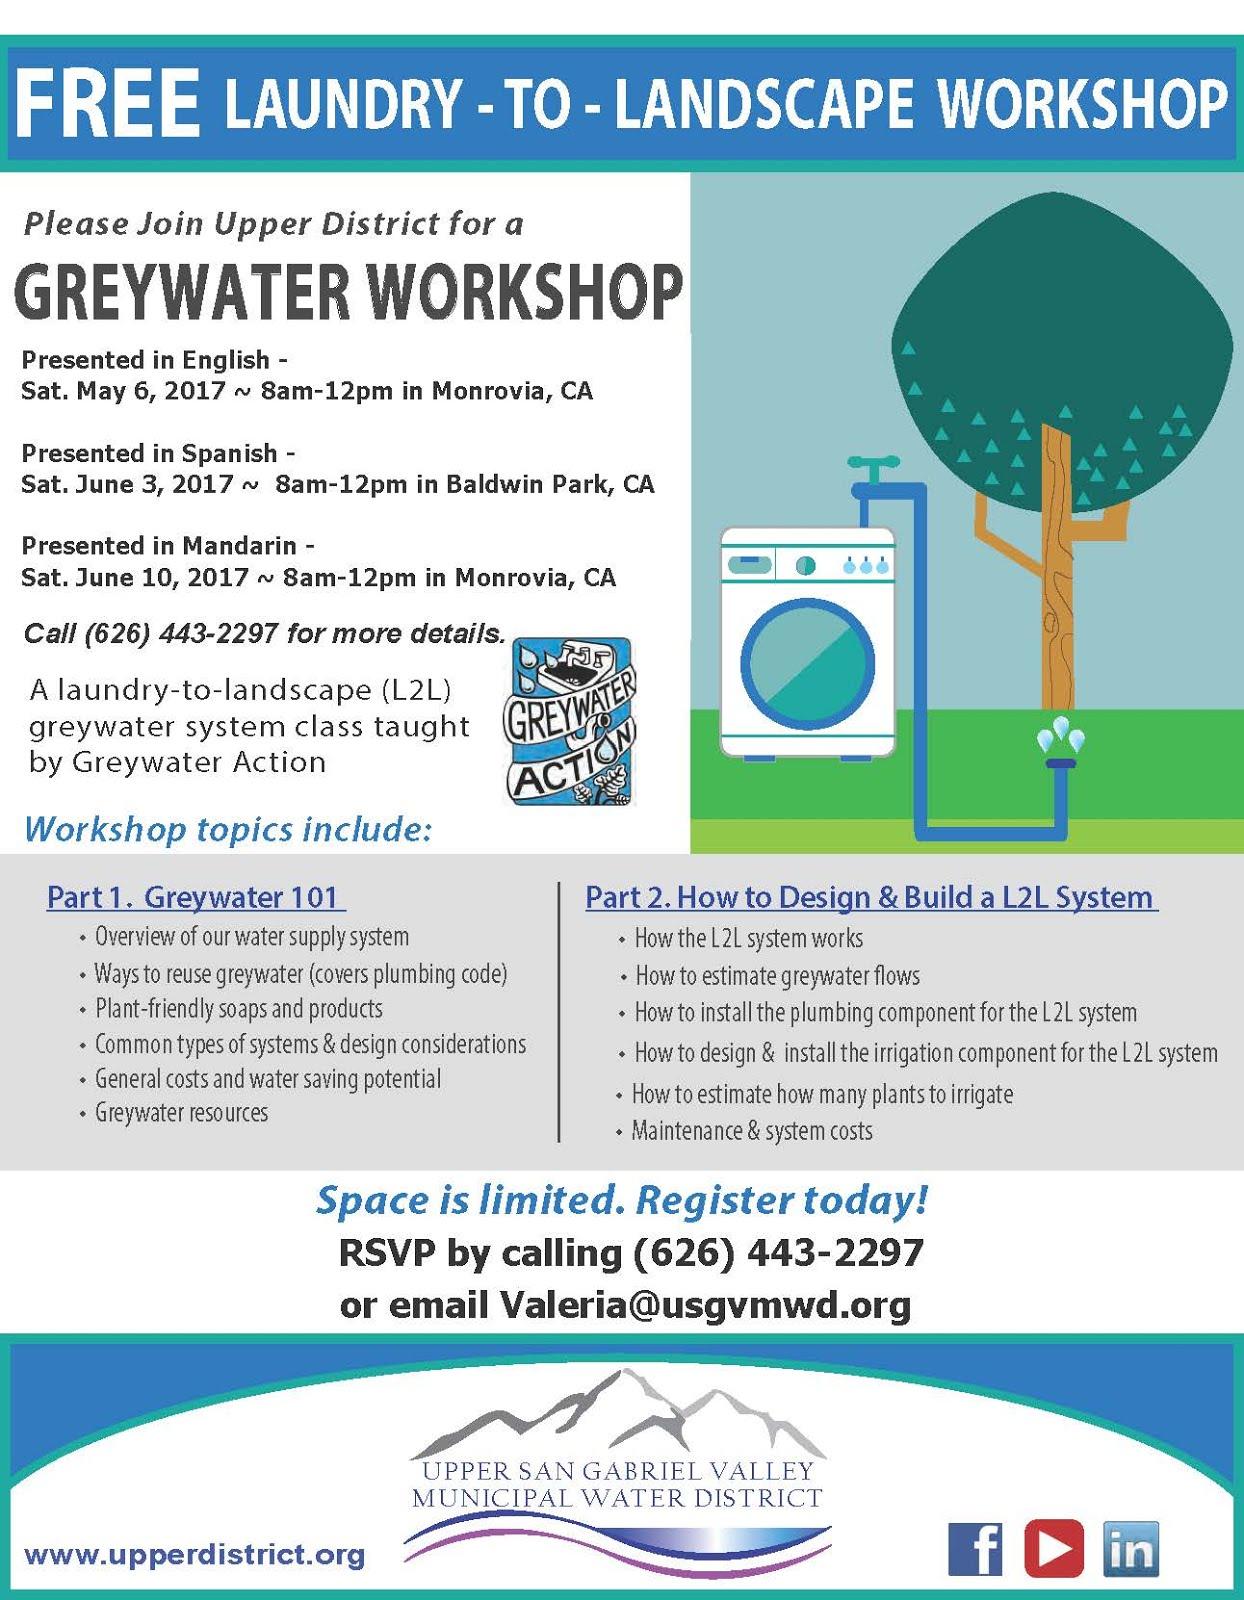 FREE Waterwise Workshops